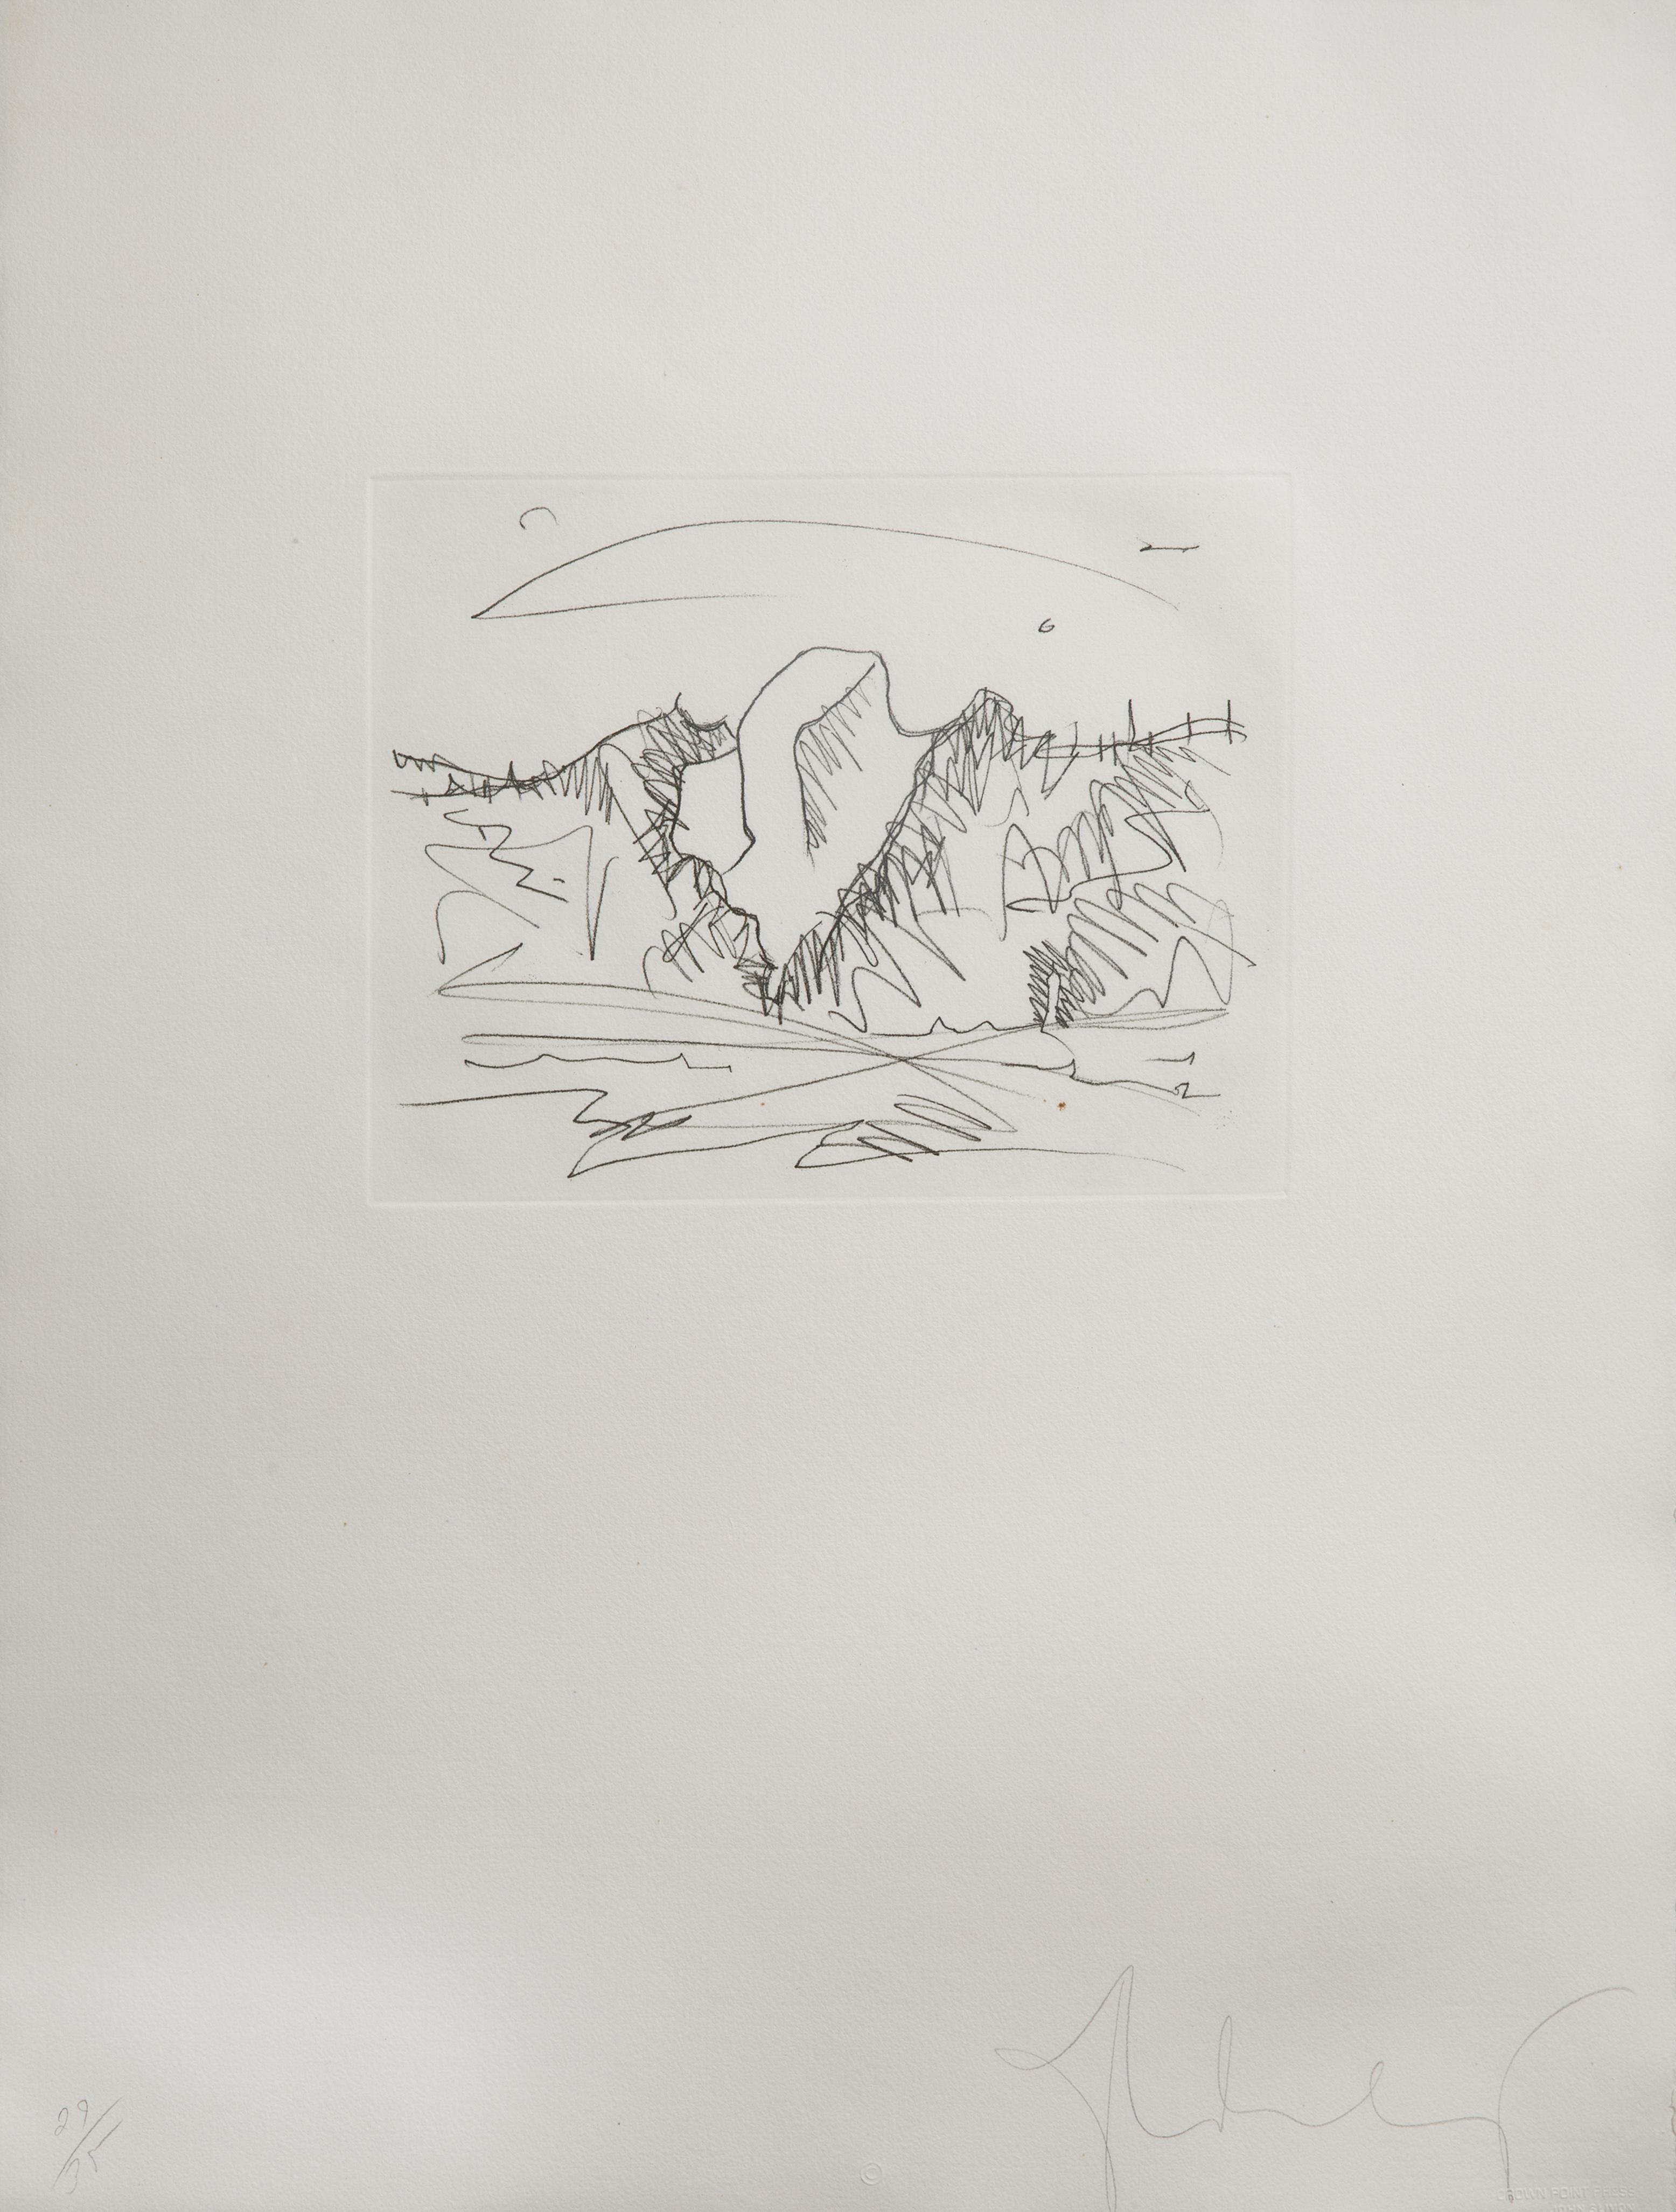 CLAES OLDENBURG (SWEDISH-AMERICAN B. 1929)